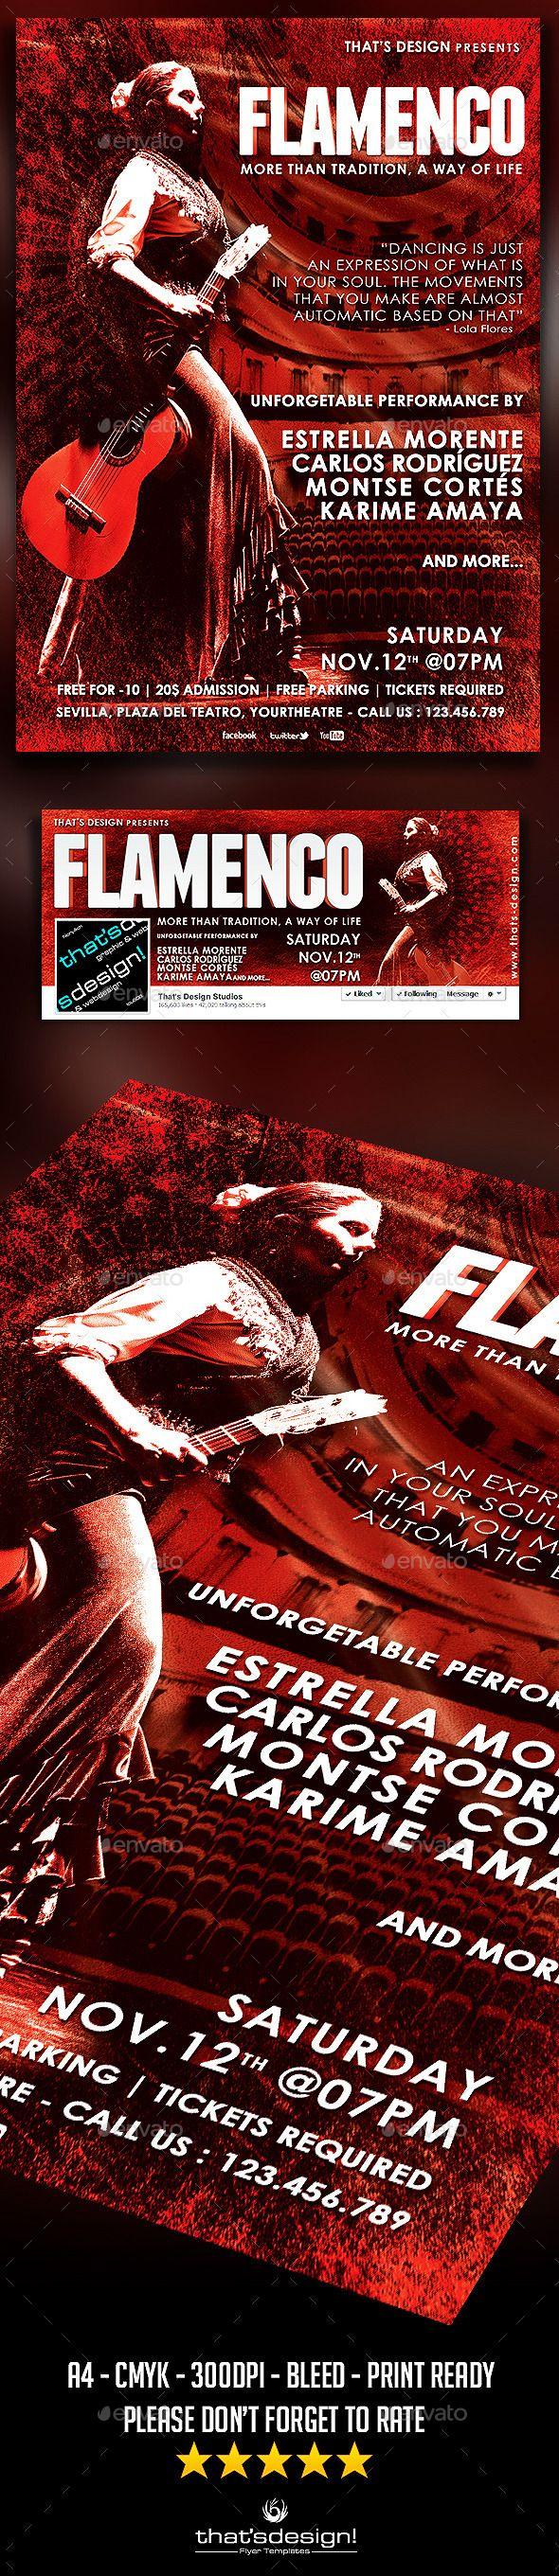 Flamenco Flyer Template V1 (CS3, 8.5x11.9, andalucia, black, bodega, concert, concert flyer, dance flyer, dance poster, flamenco, flamenco flyer, flamenco party, flamenco poster, flyer design, gipsy, grunge, guitar concert, lou606, red, retro, spain, spanish flyer, tango, tango flyer, tango poster, theater, theatre, vintage)